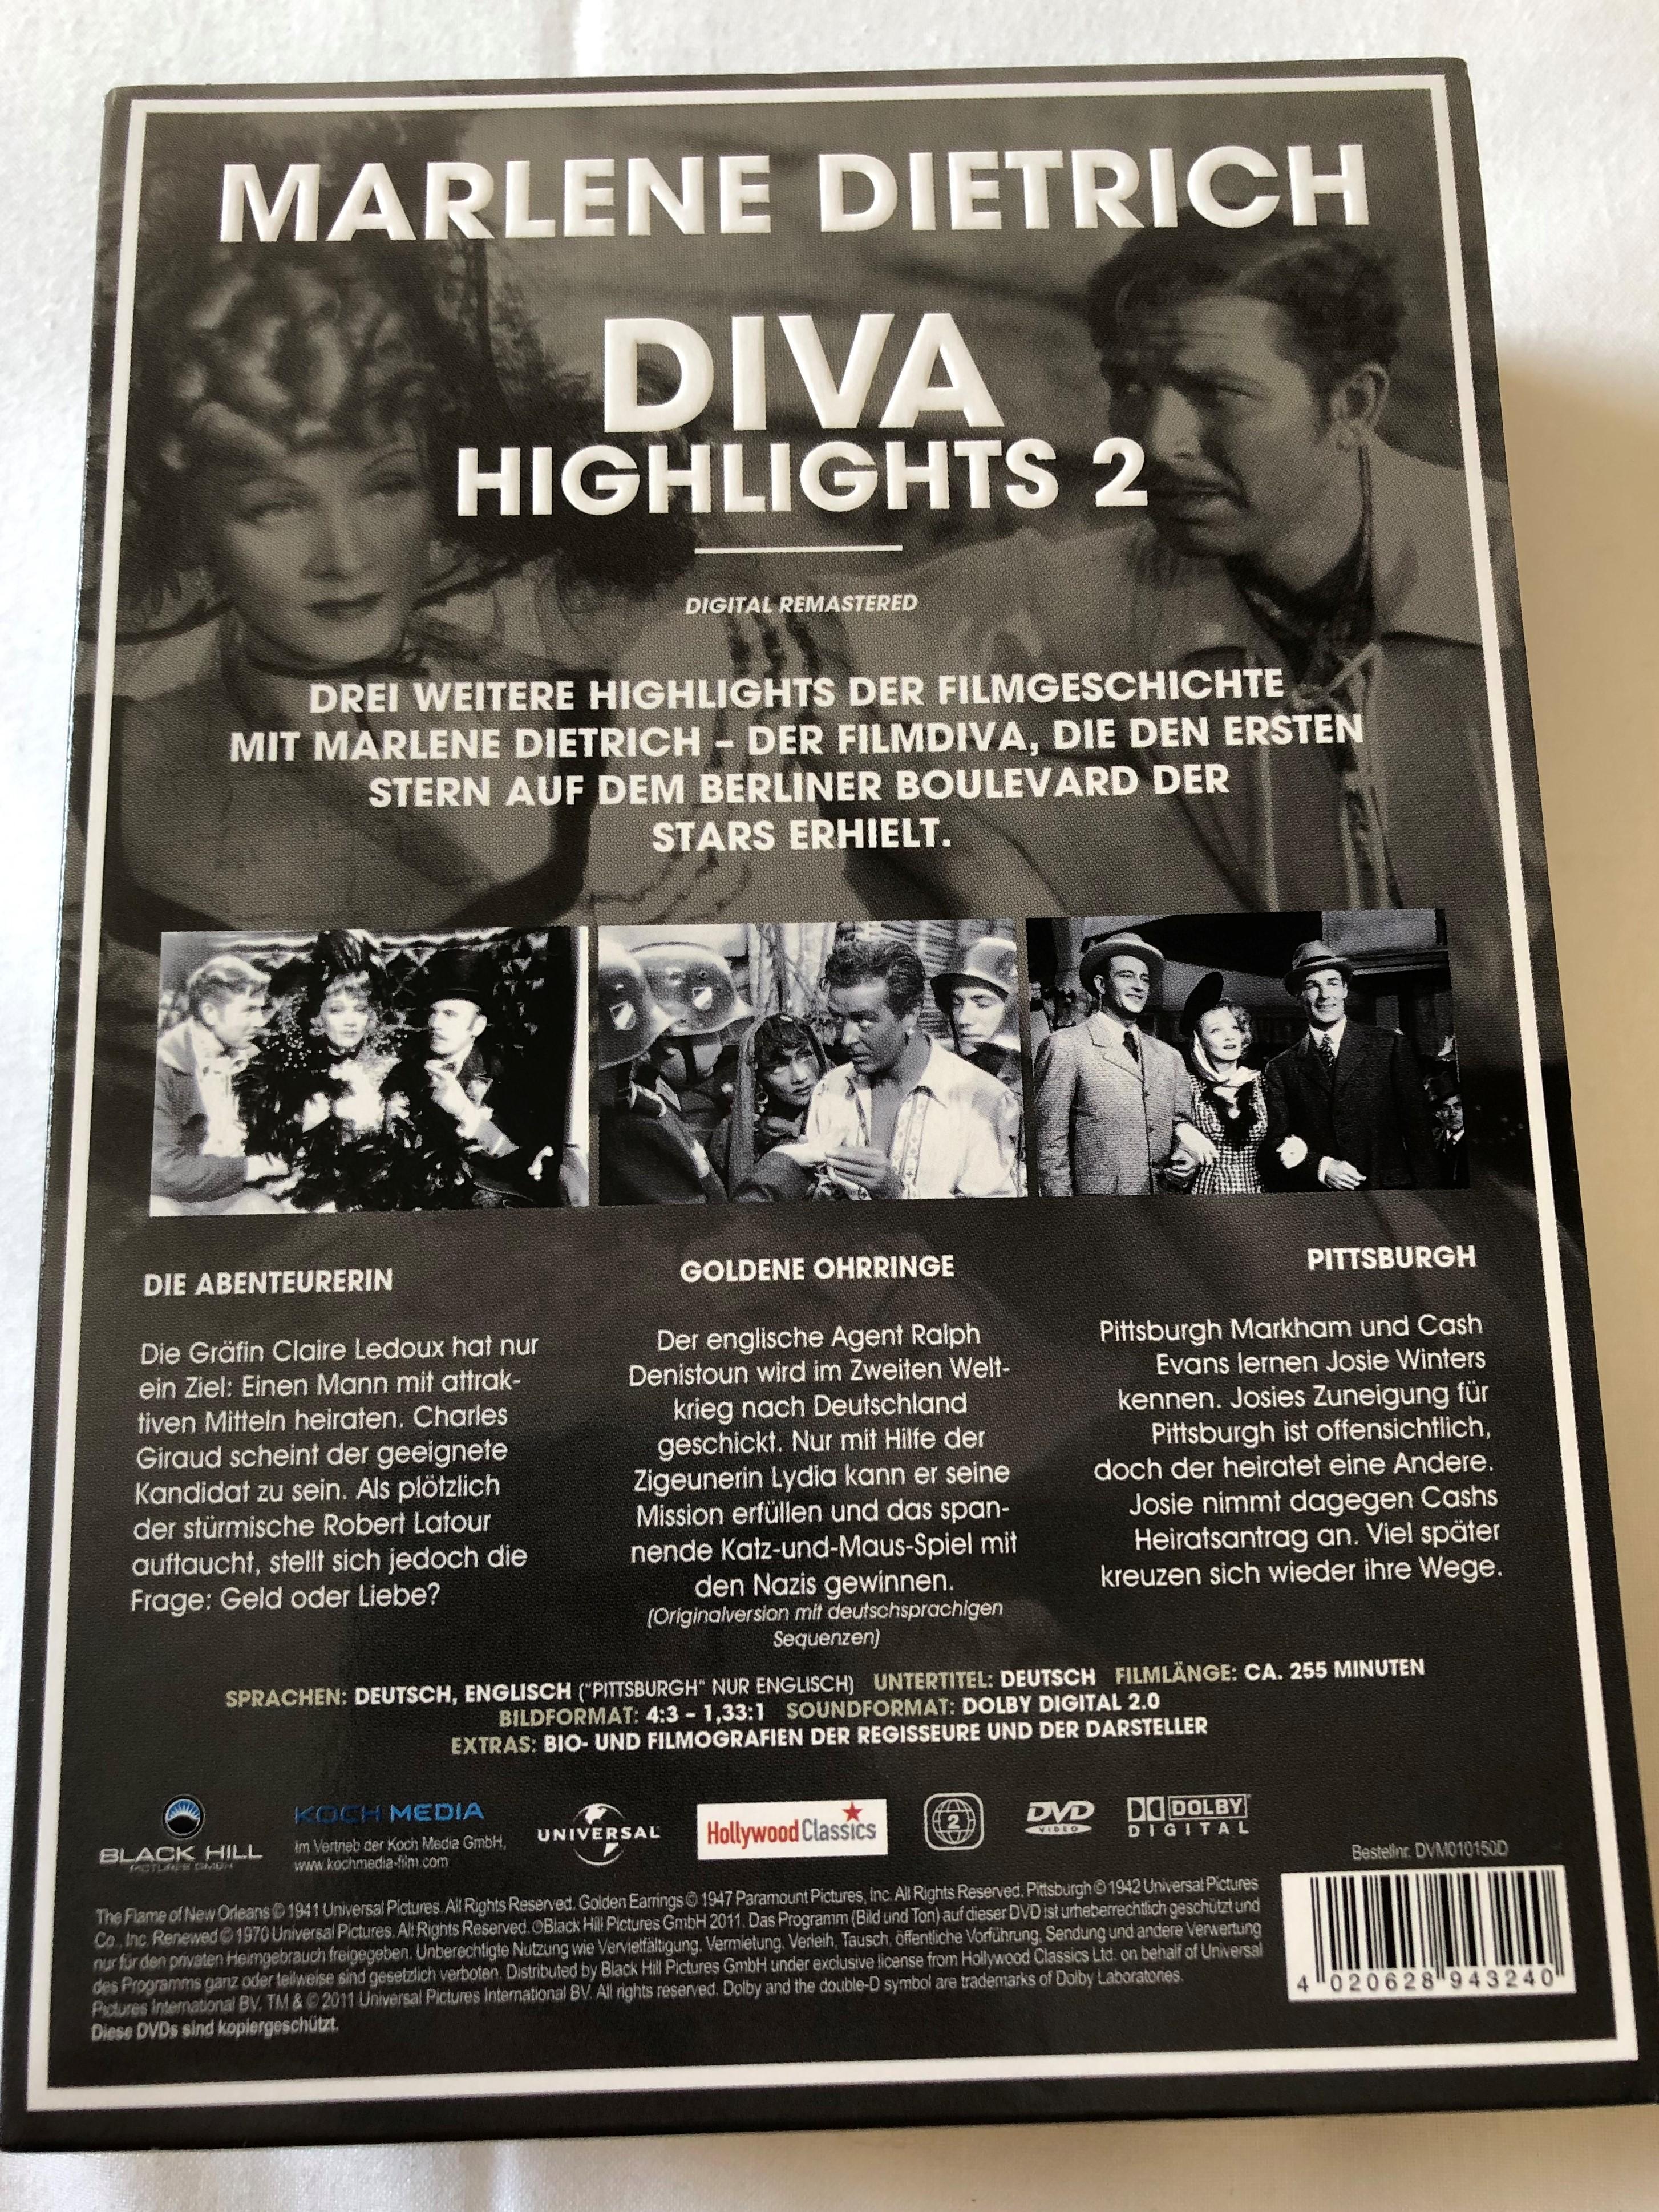 marlene-dietrich-diva-highlights-2-dvd-set-3-highlights-black-white-classics-with-marlene-dietrich-the-film-diva-the-flame-of-new-orleans-golden-earring-pittsburgh-digital-remastered-3-discs-2-.jpg